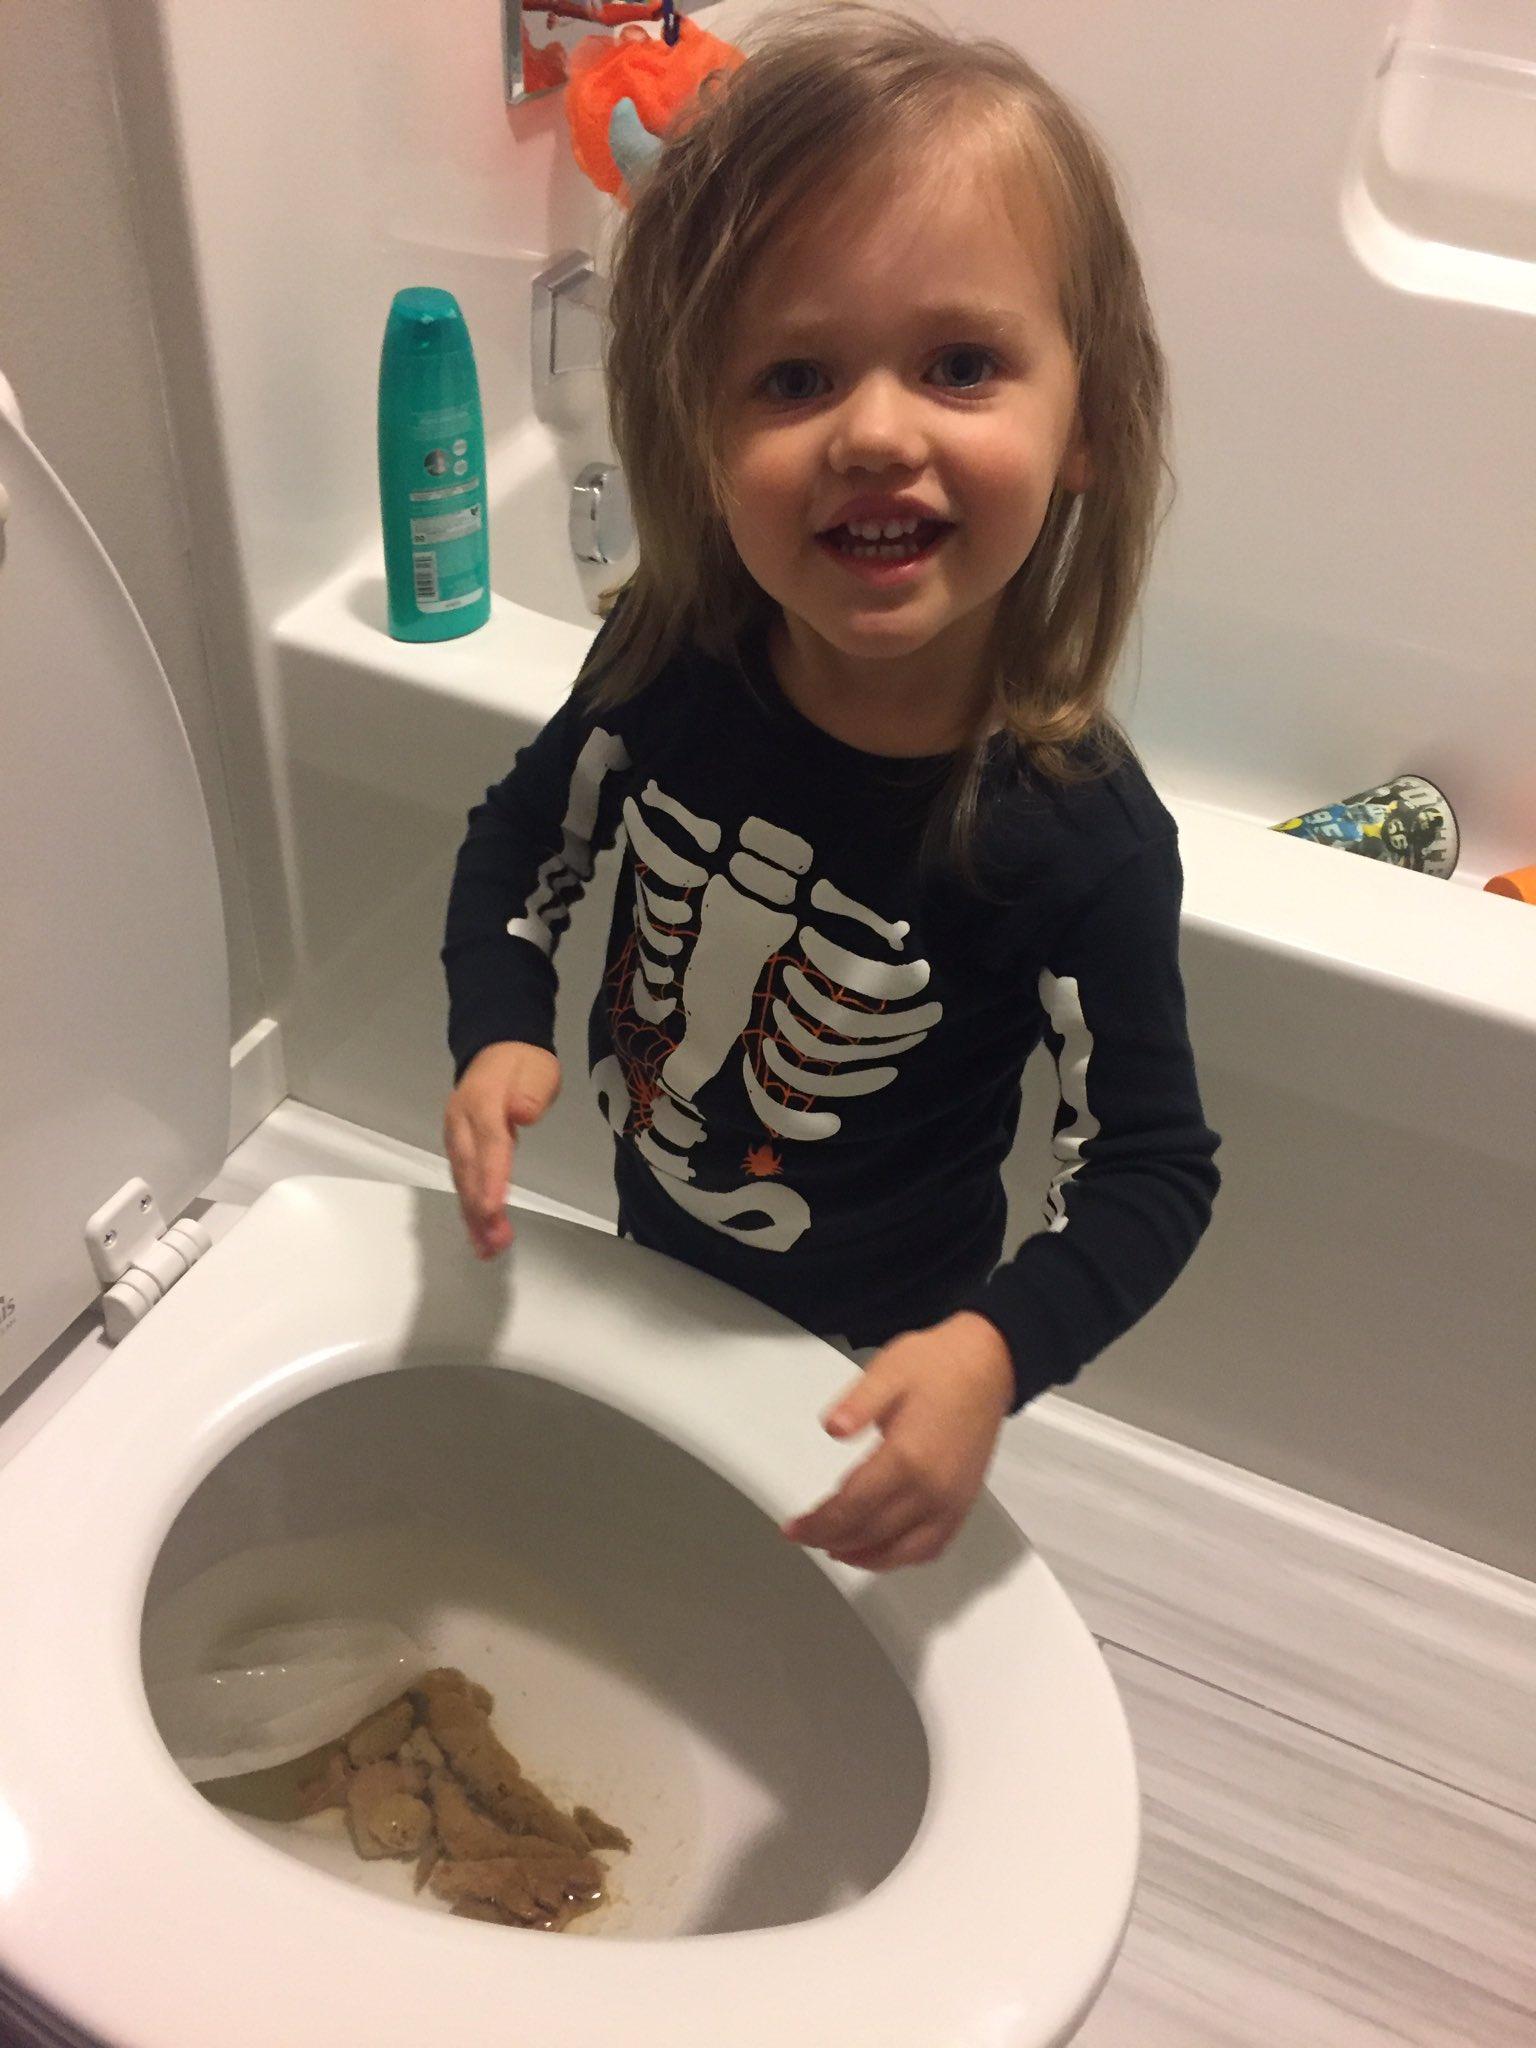 Beautiful Girls Pooping On Toilet  New Girl Wallpaper-7661